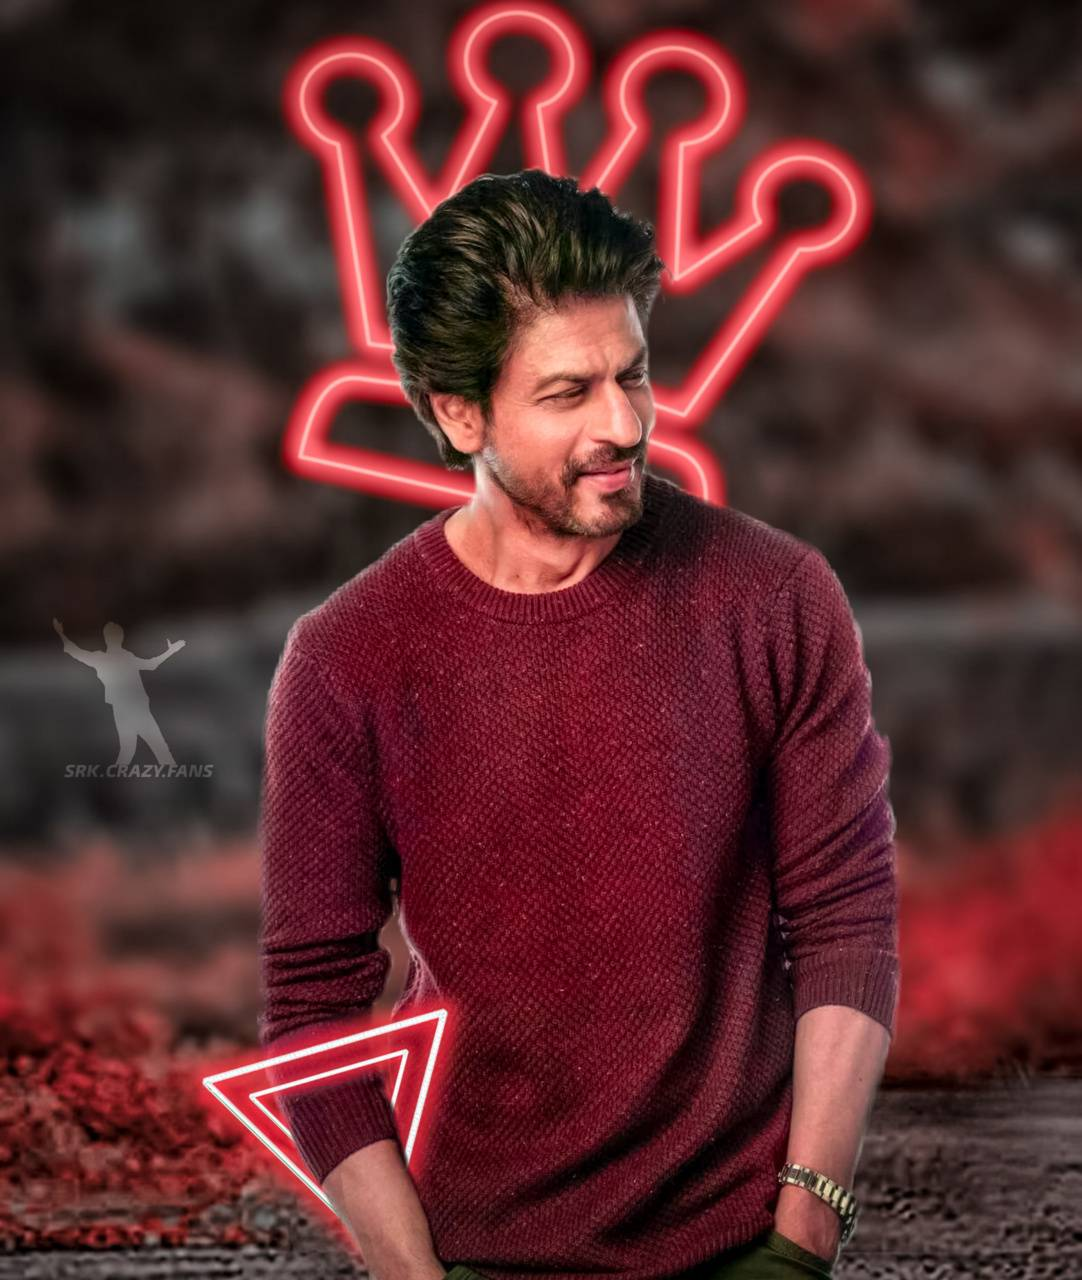 Shahrukh Khan Wallpaper By Srkcrazyfans A9 Free On Zedge